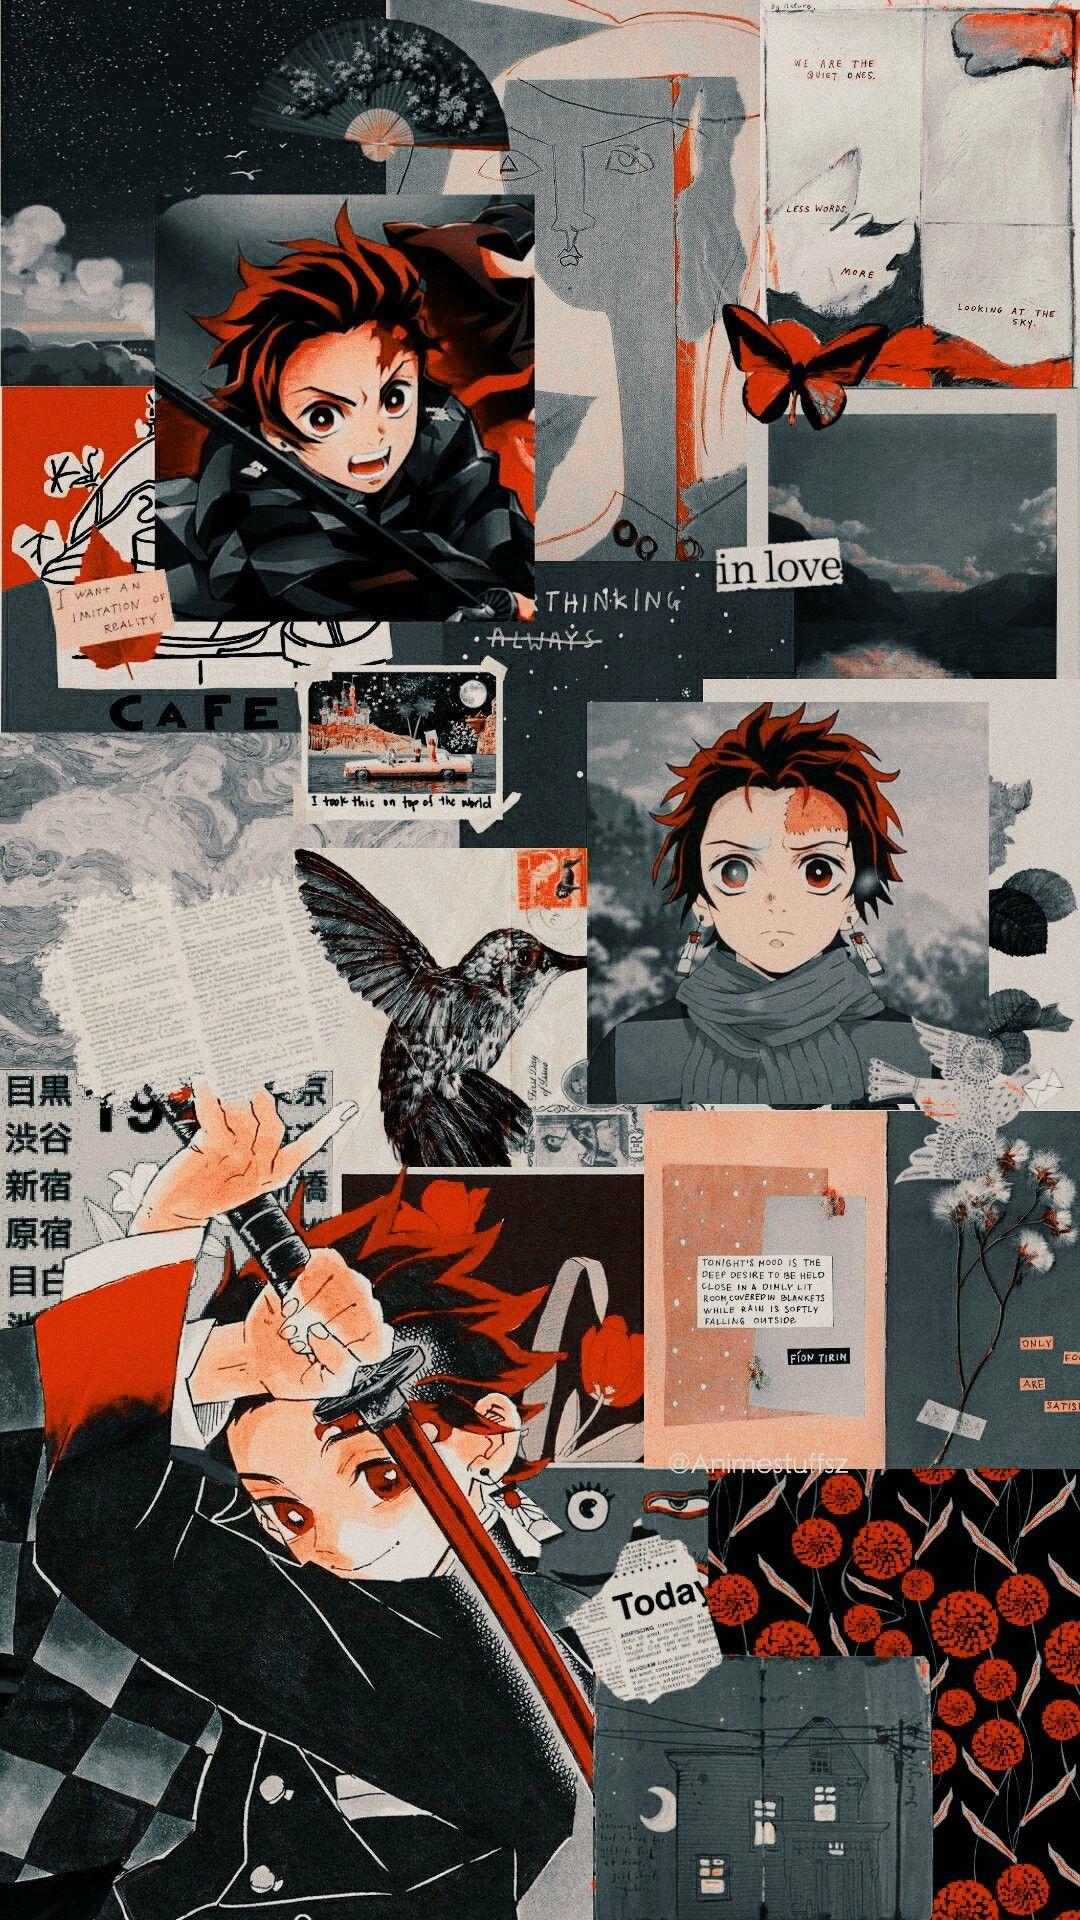 Pin By Jihyo On Otaku Animes Manga Cute Anime Wallpaper Cool Anime Wallpapers Anime Wallpaper Iphone